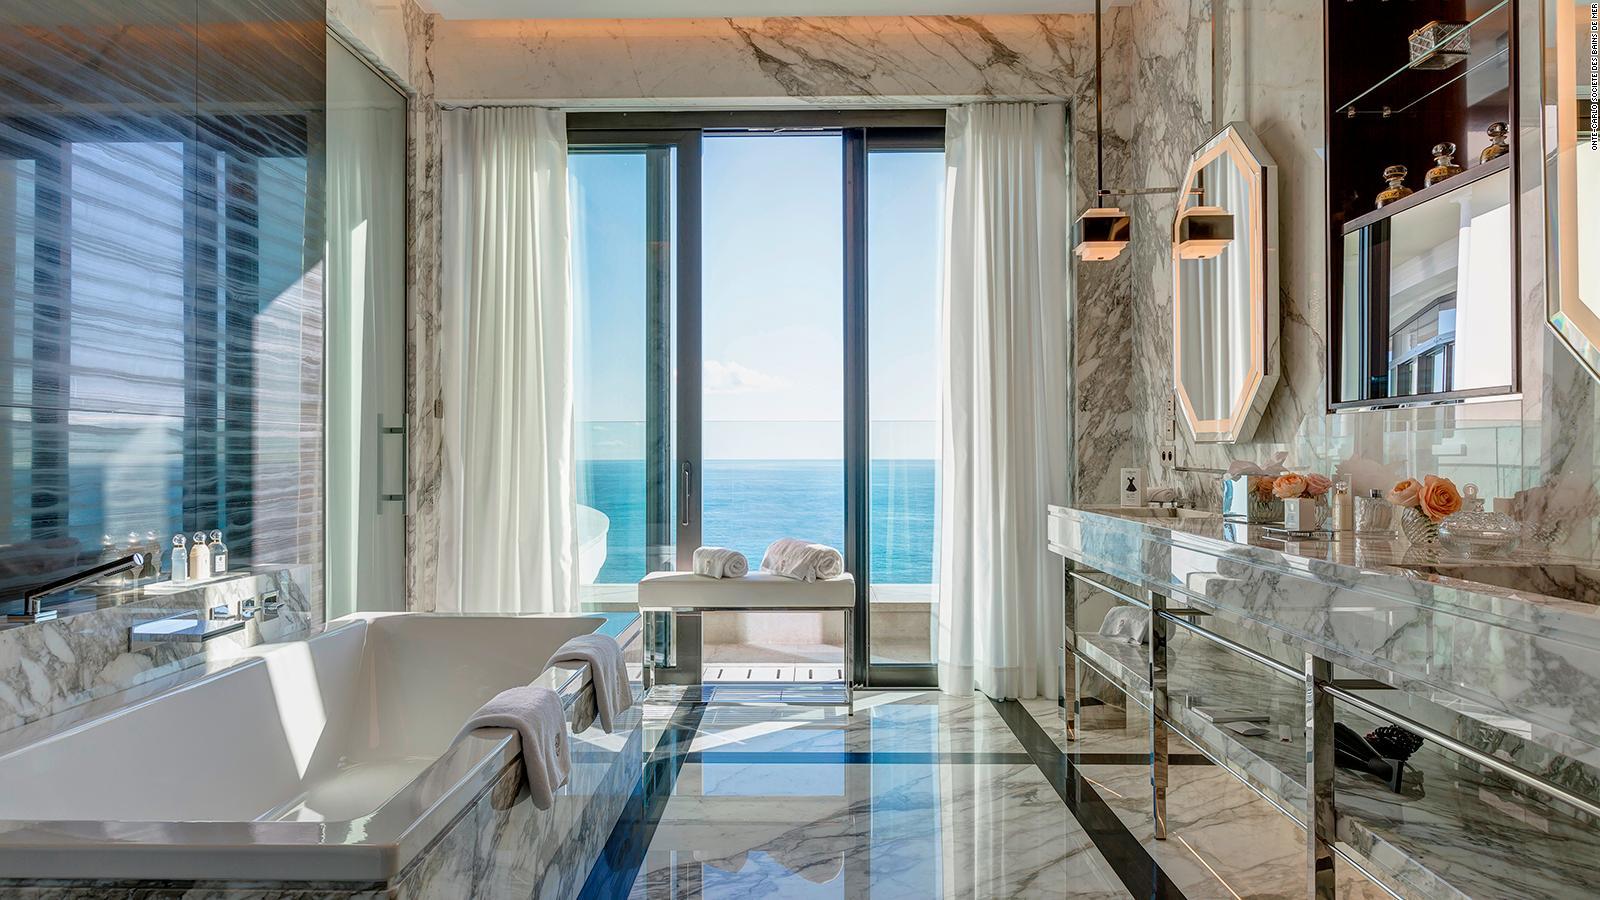 Princess Grace hotel suite in Monte Carlo is $48,000 a night | CNN ...